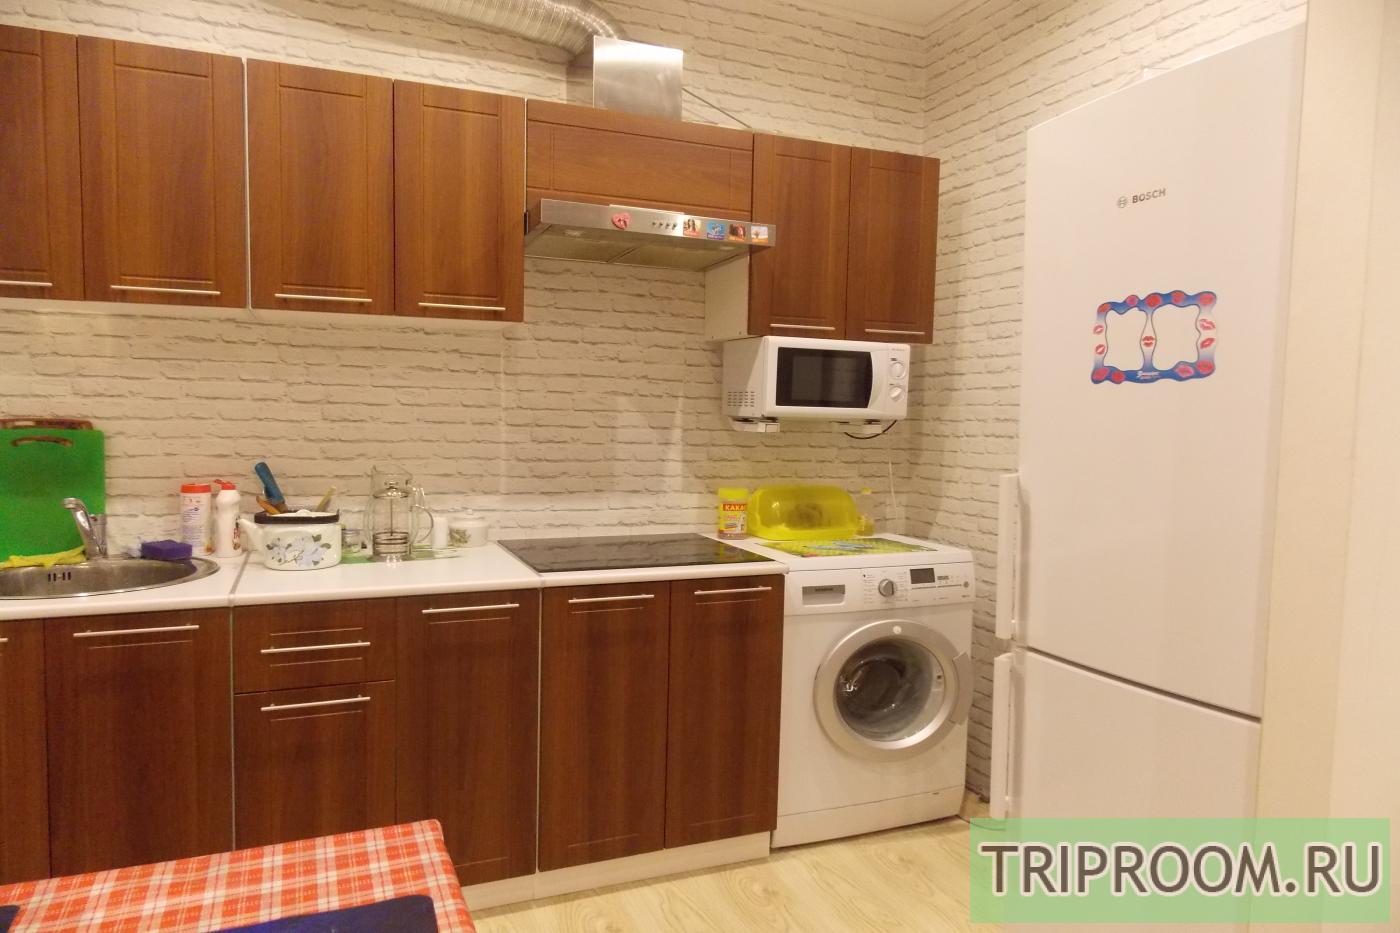 1-комнатная квартира посуточно (вариант № 14659), ул. Московский проспект, фото № 3